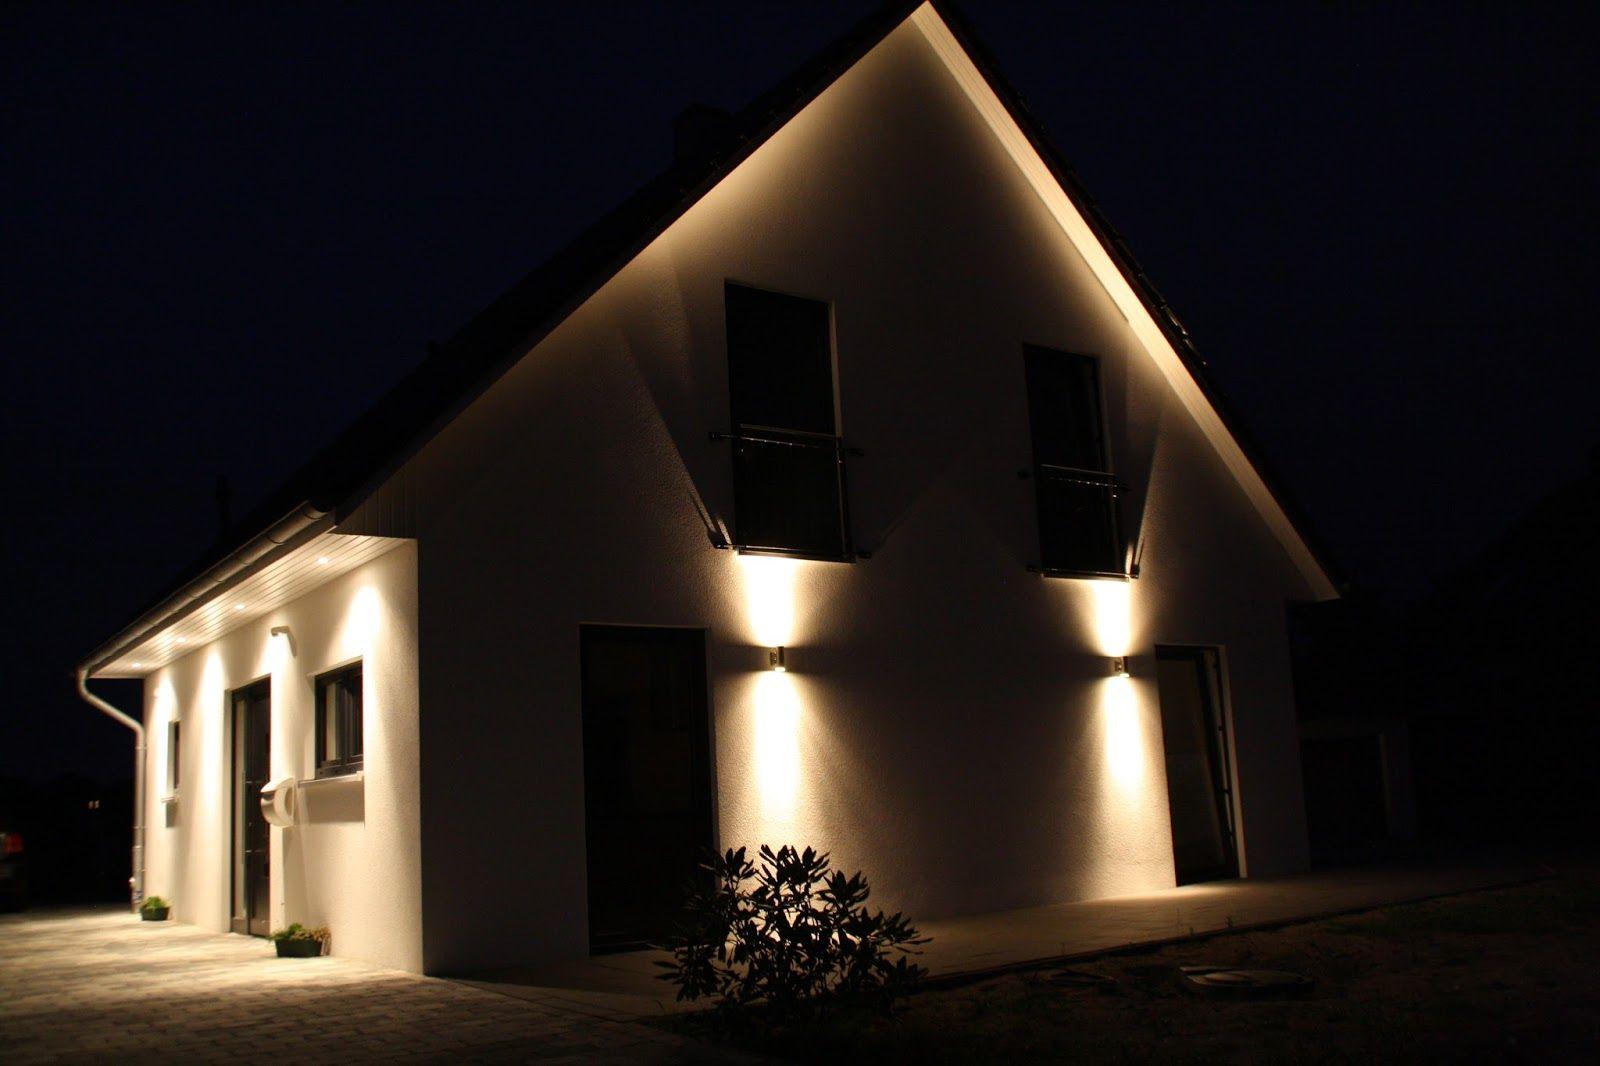 aussenbeleuchtung pixel licht aussenlicht pinterest au enbeleuchtung. Black Bedroom Furniture Sets. Home Design Ideas